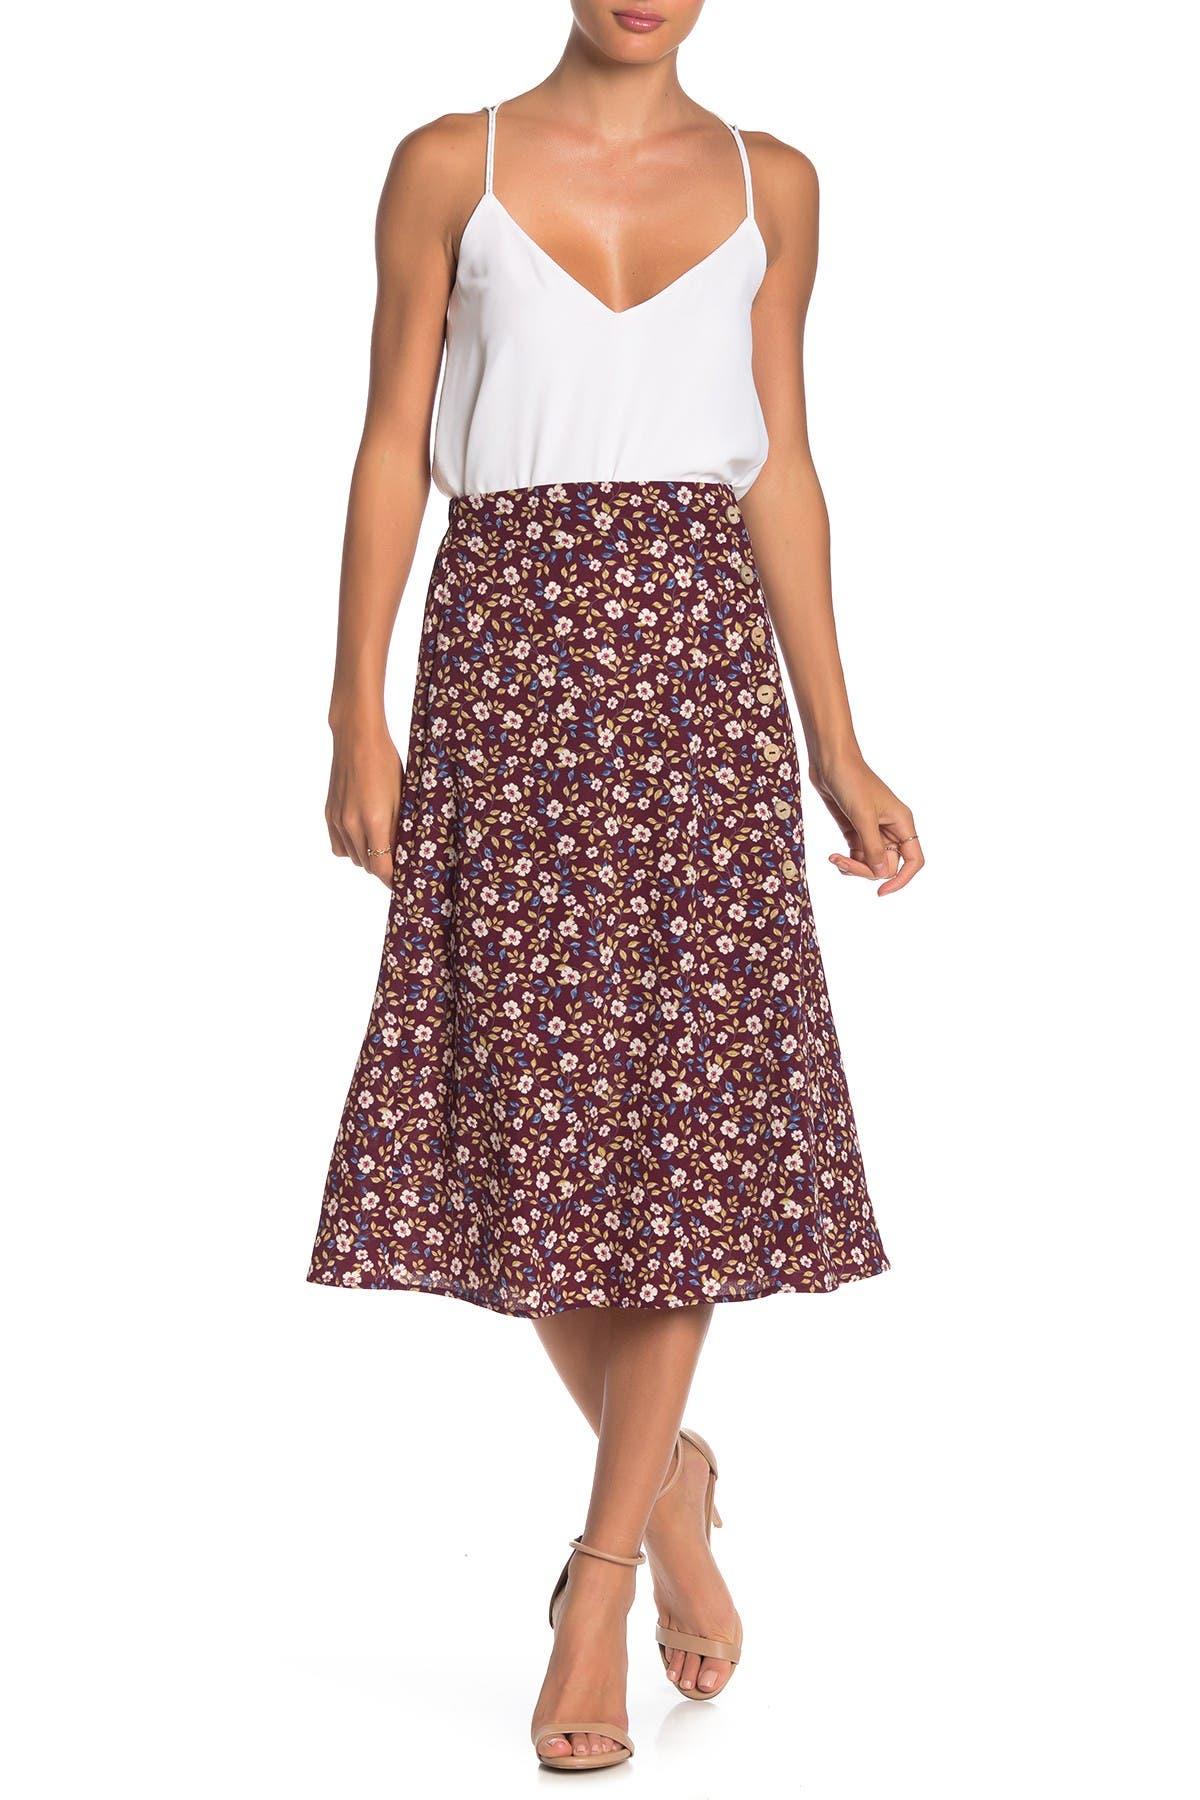 Image of GOOD LUCK GEM Floral Midi Skirt